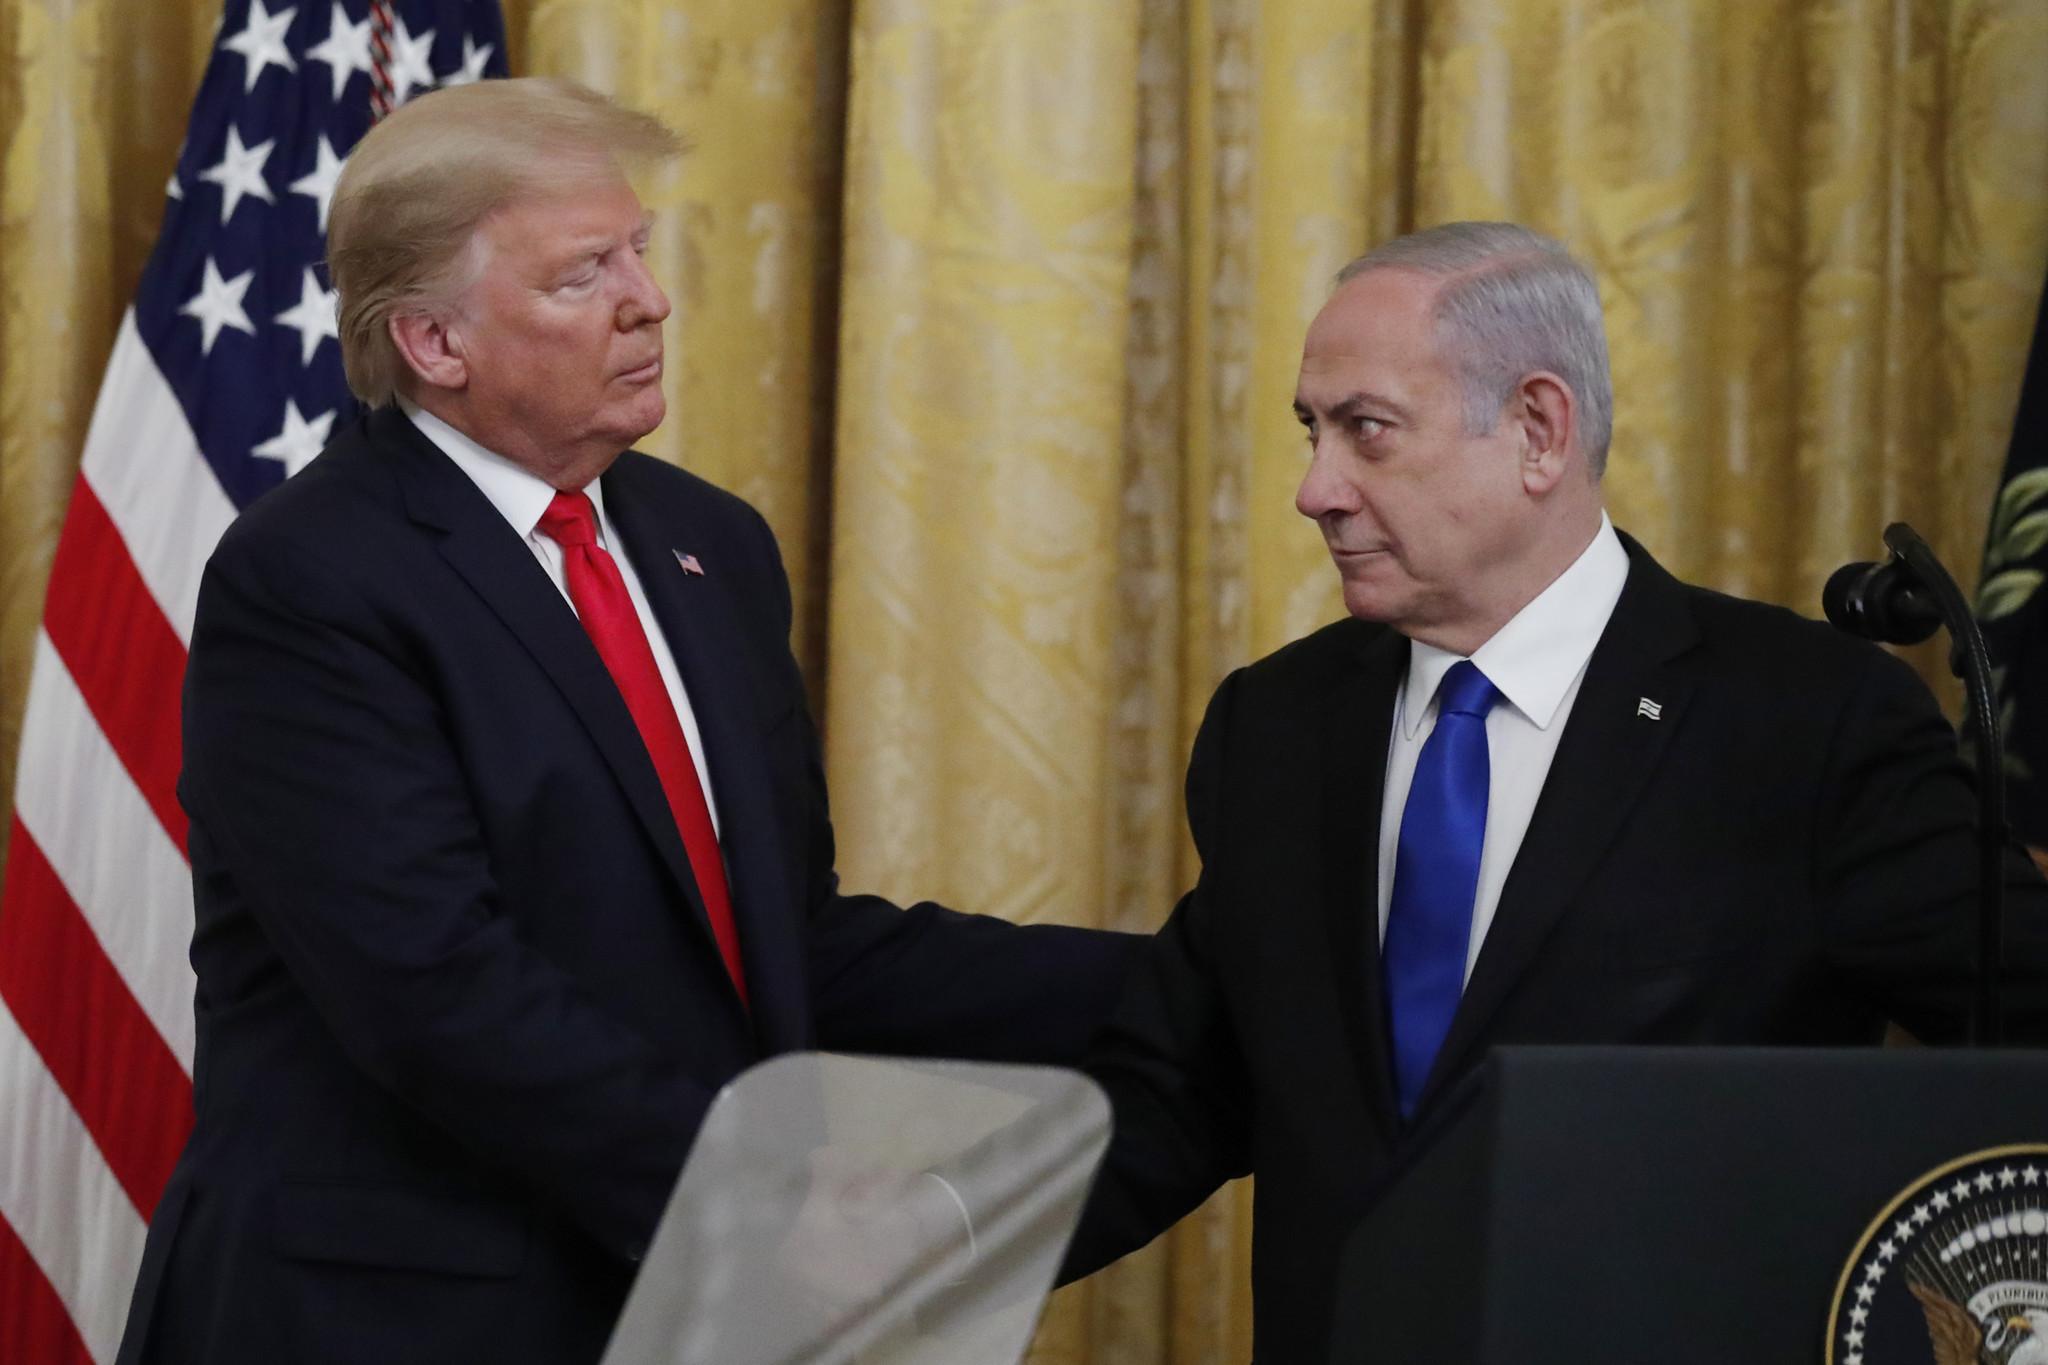 Piece by peace: Trump tries again on an Israeli-Palestinian deal